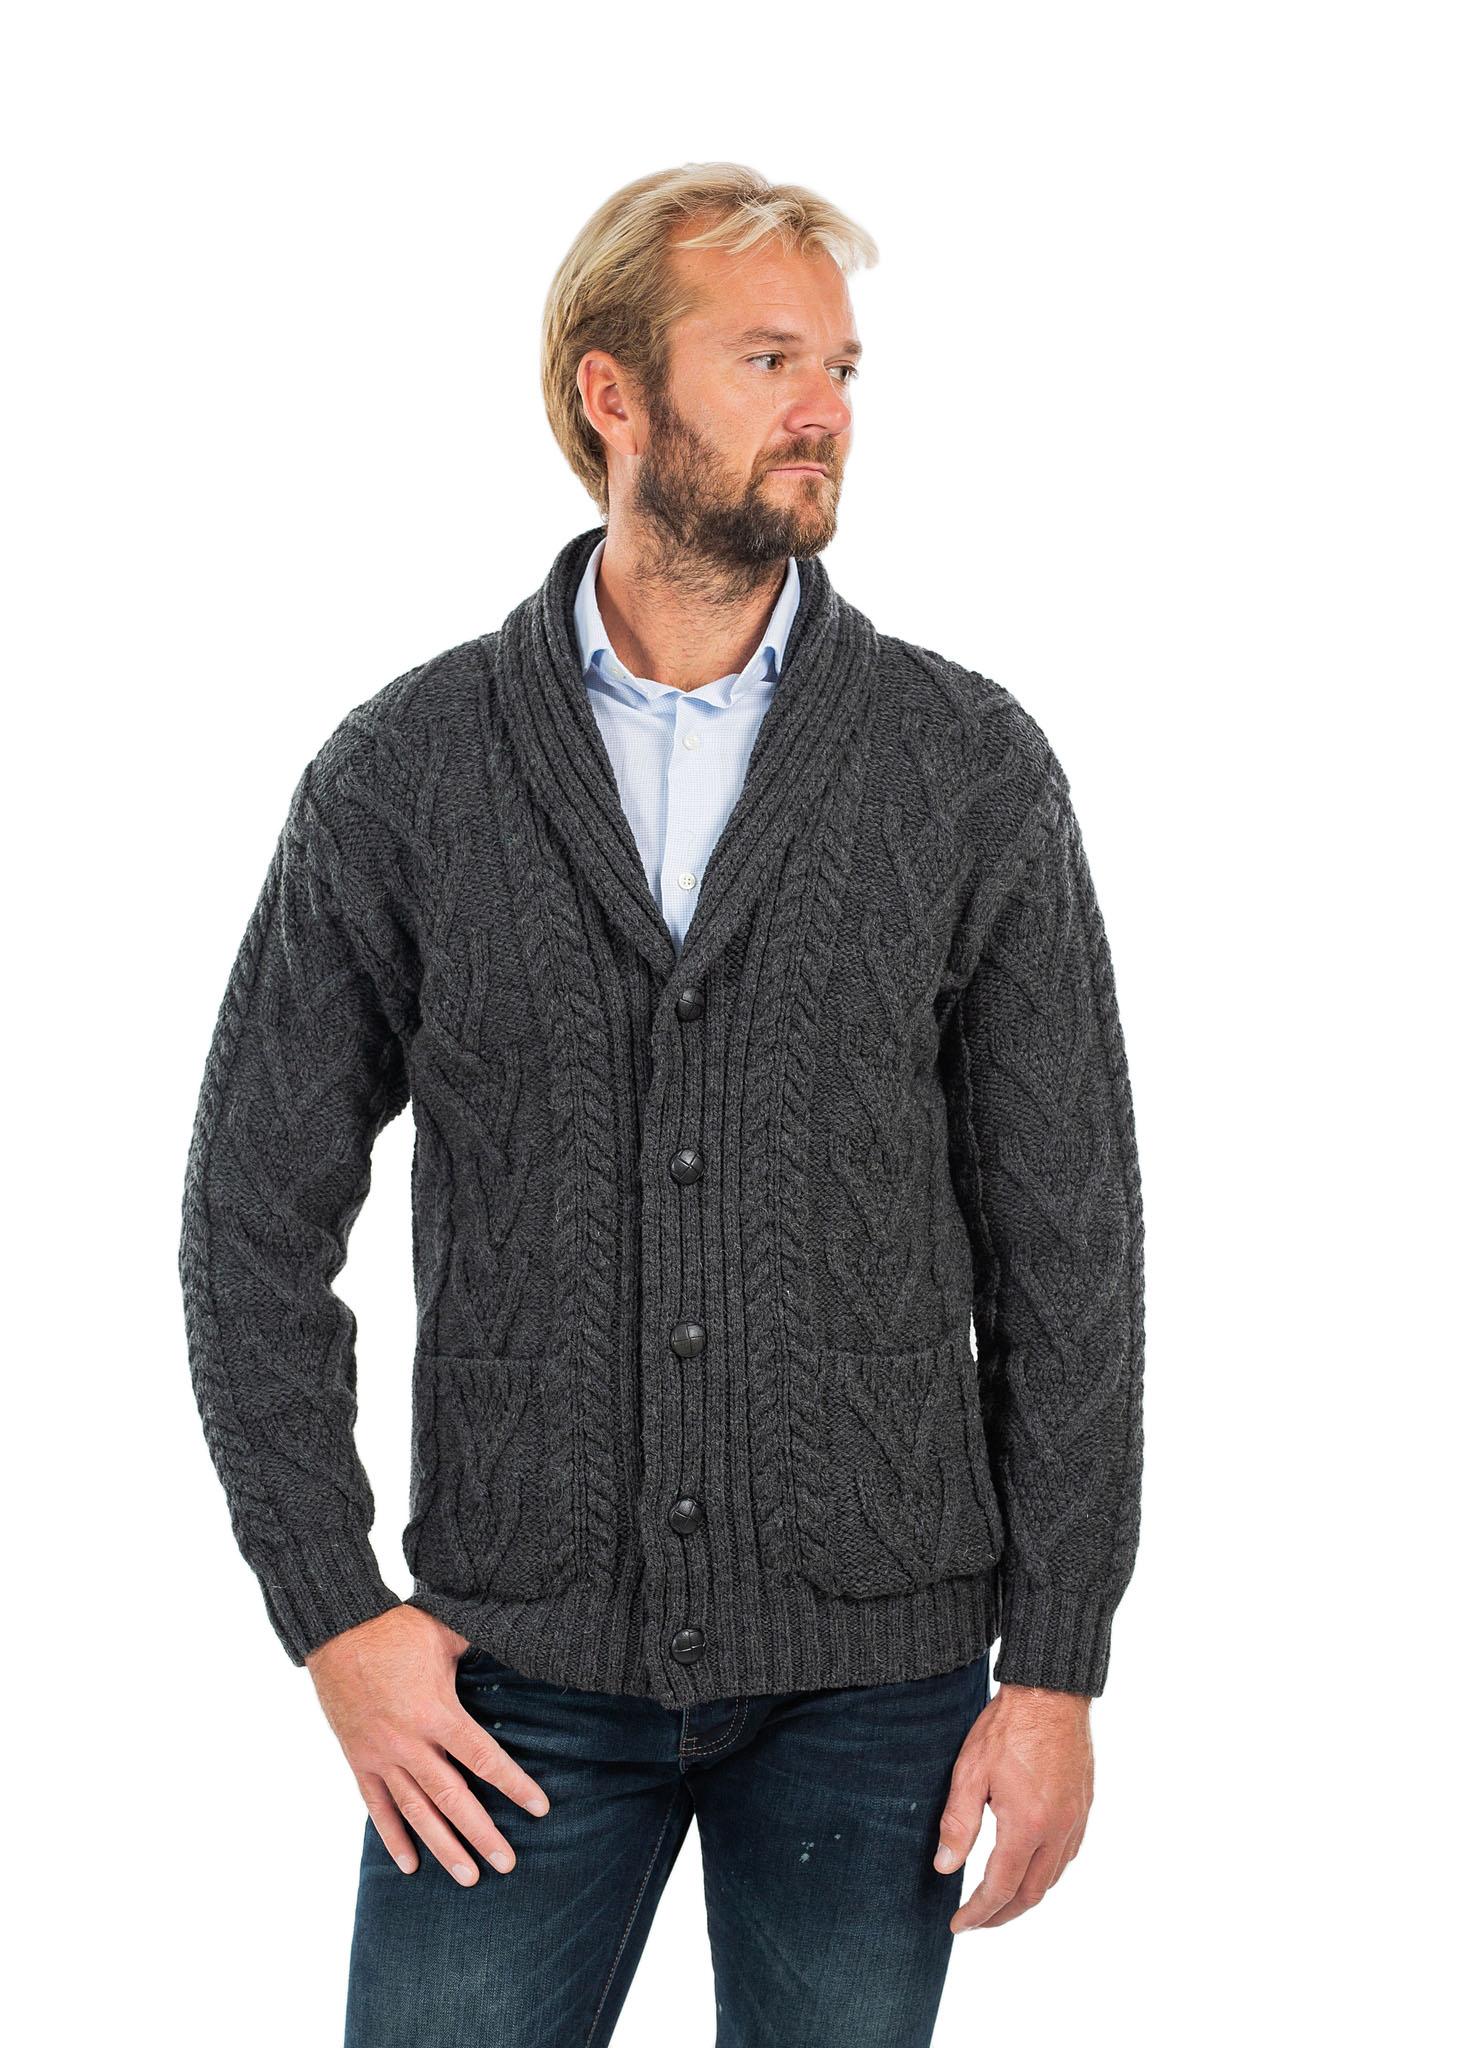 SAOL-Mens-Irish-Merino-Wool-Cardigan-Shawl-Collar-Front-Pockets-Aran-Cable-Knit thumbnail 30